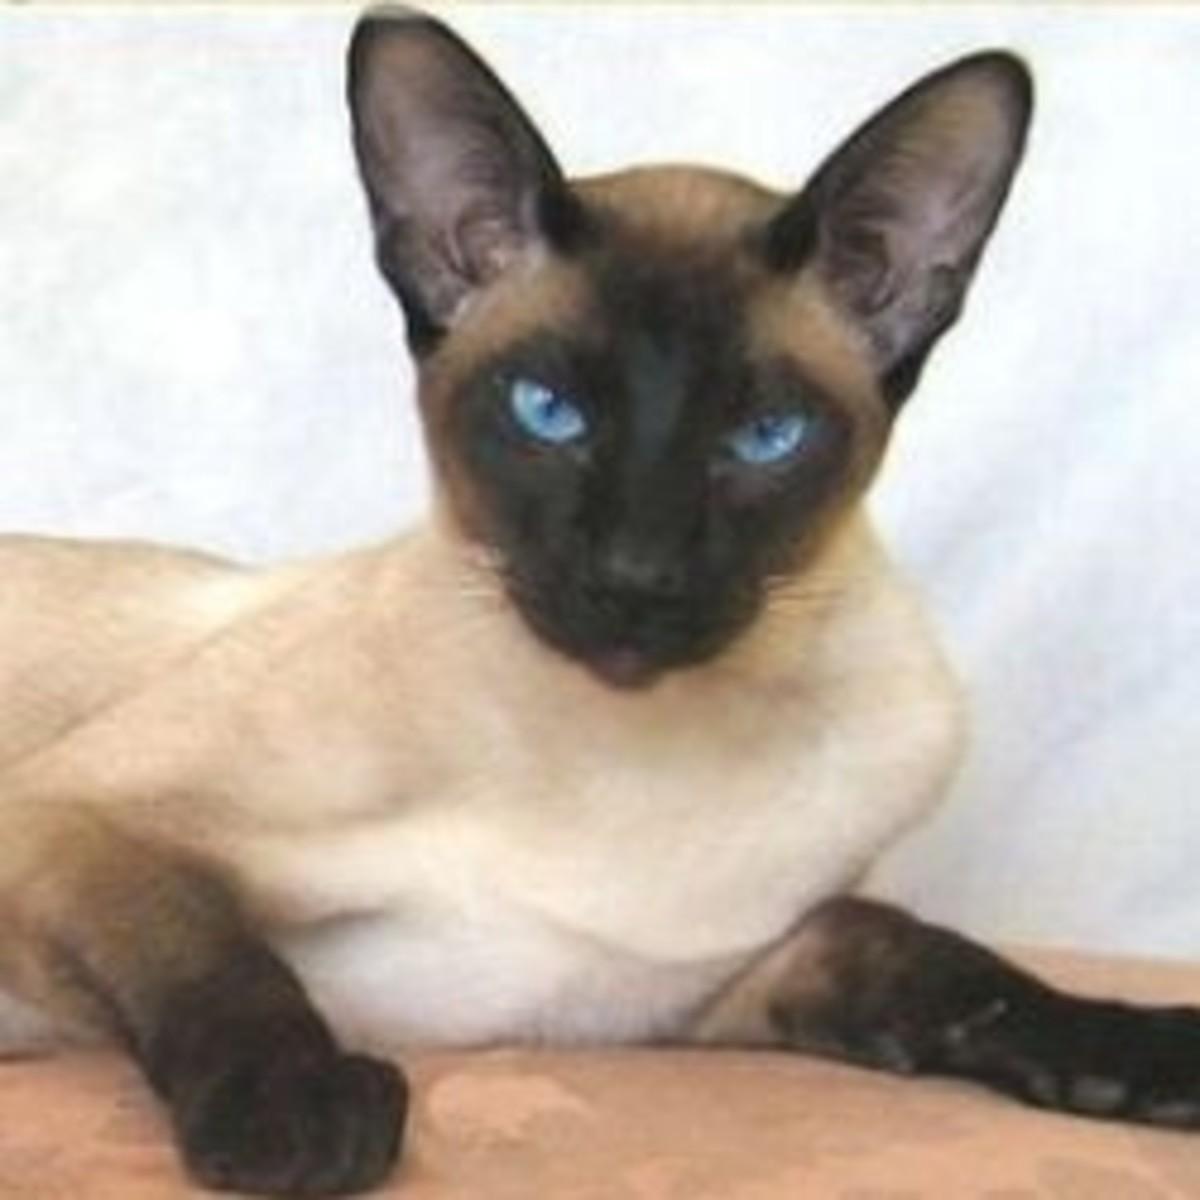 Suave, sophisticated Siamese cat